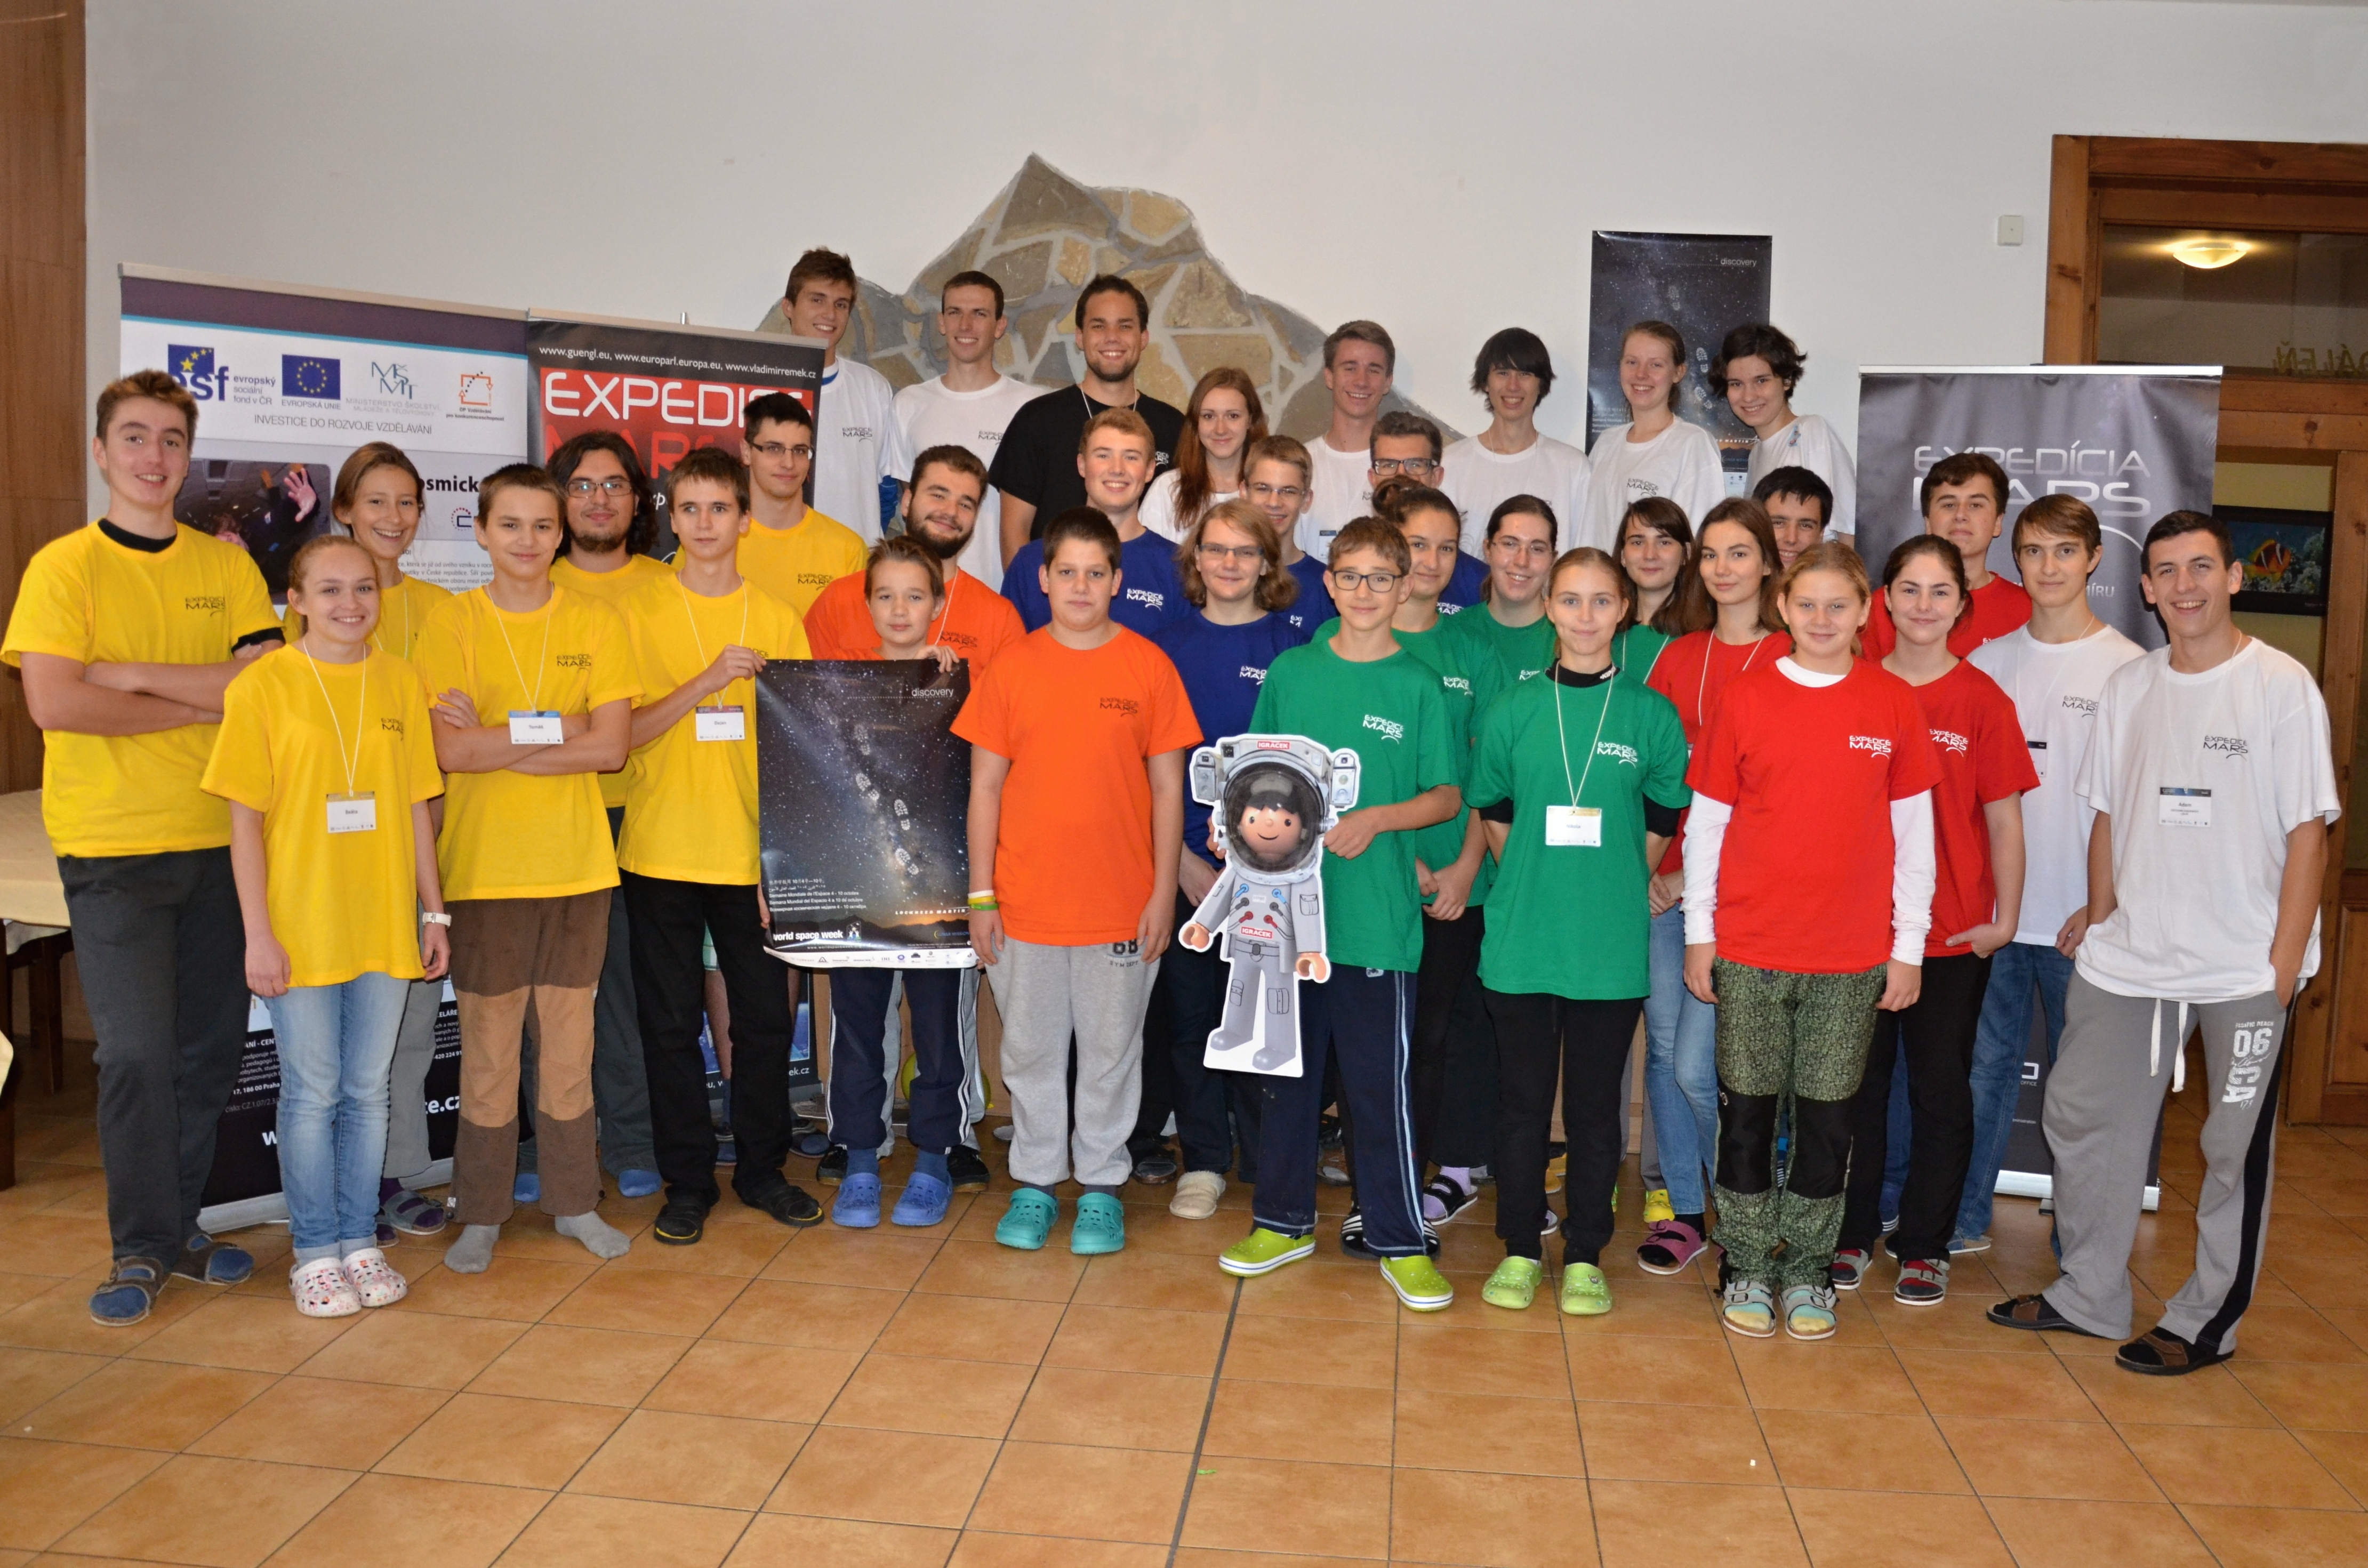 Obr.1: Semifinalisti súťaže Expedice Mars 2015